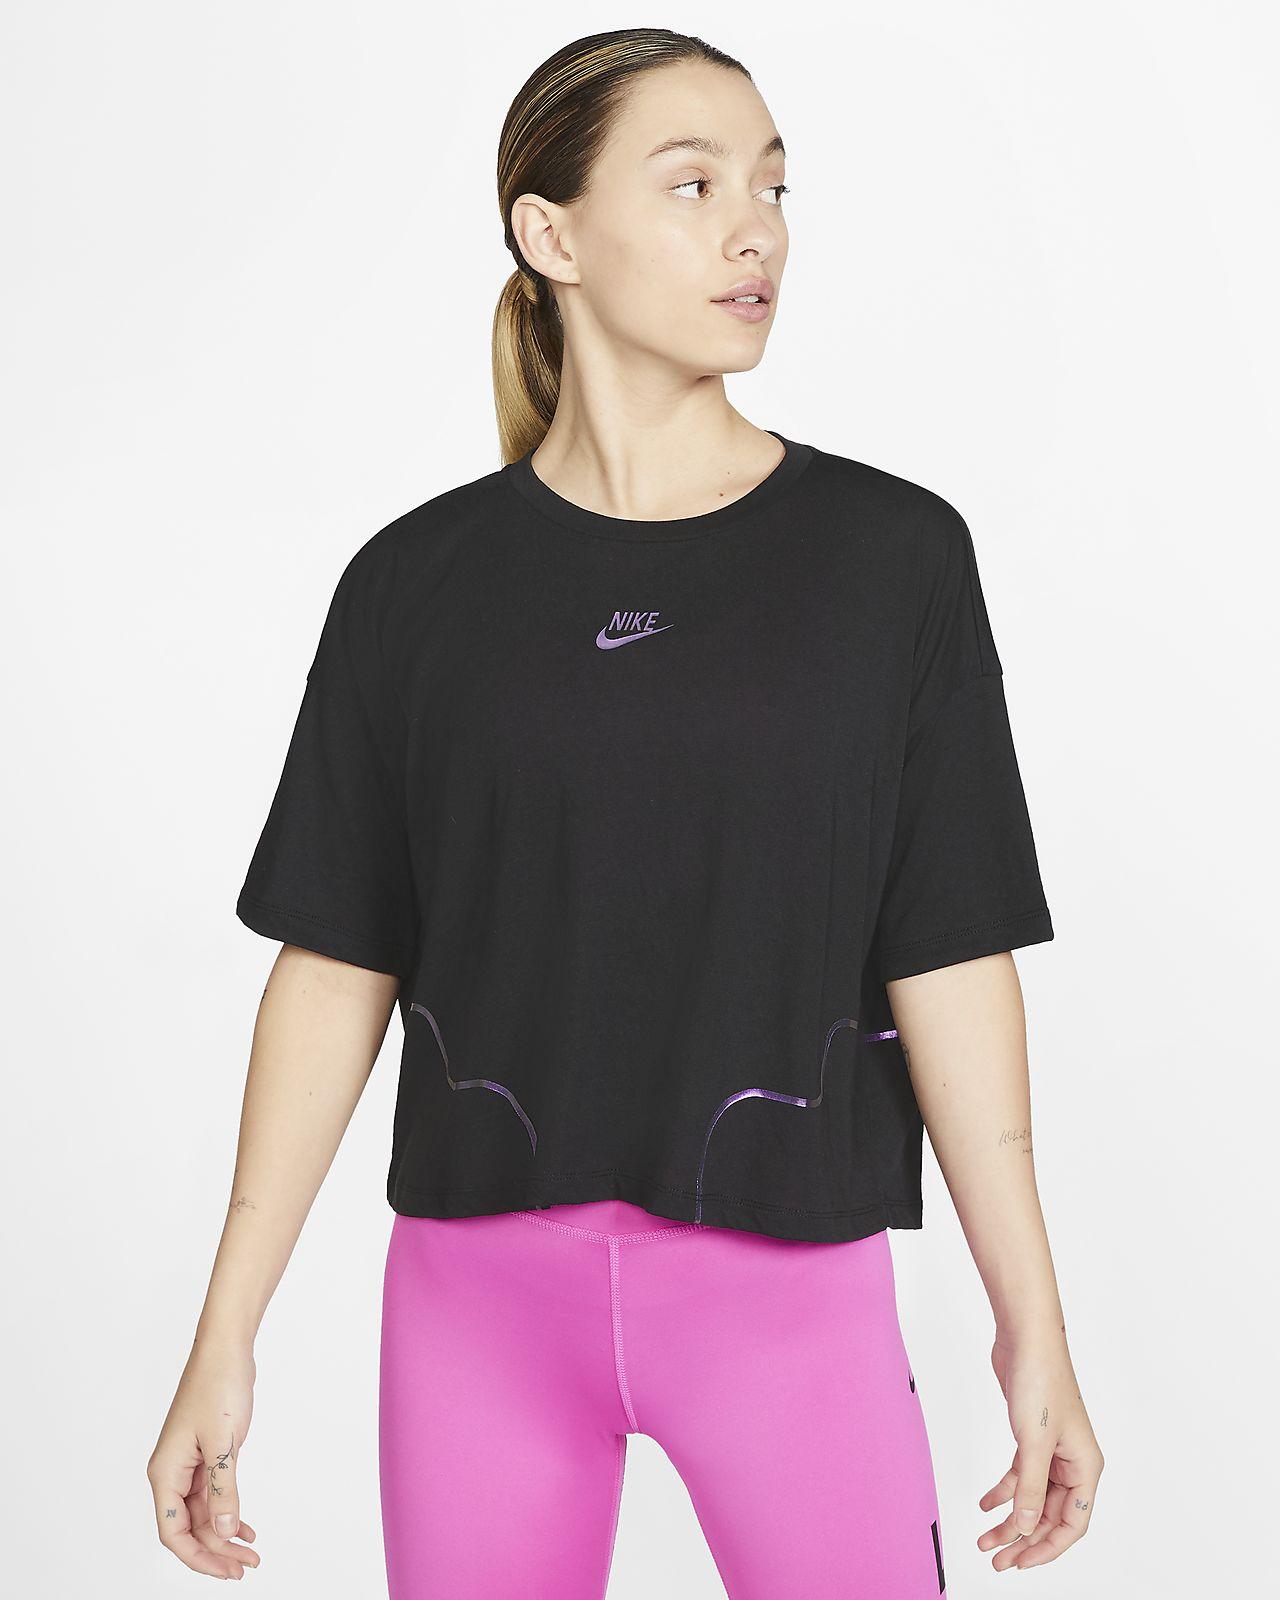 Nike Pro Women's Top